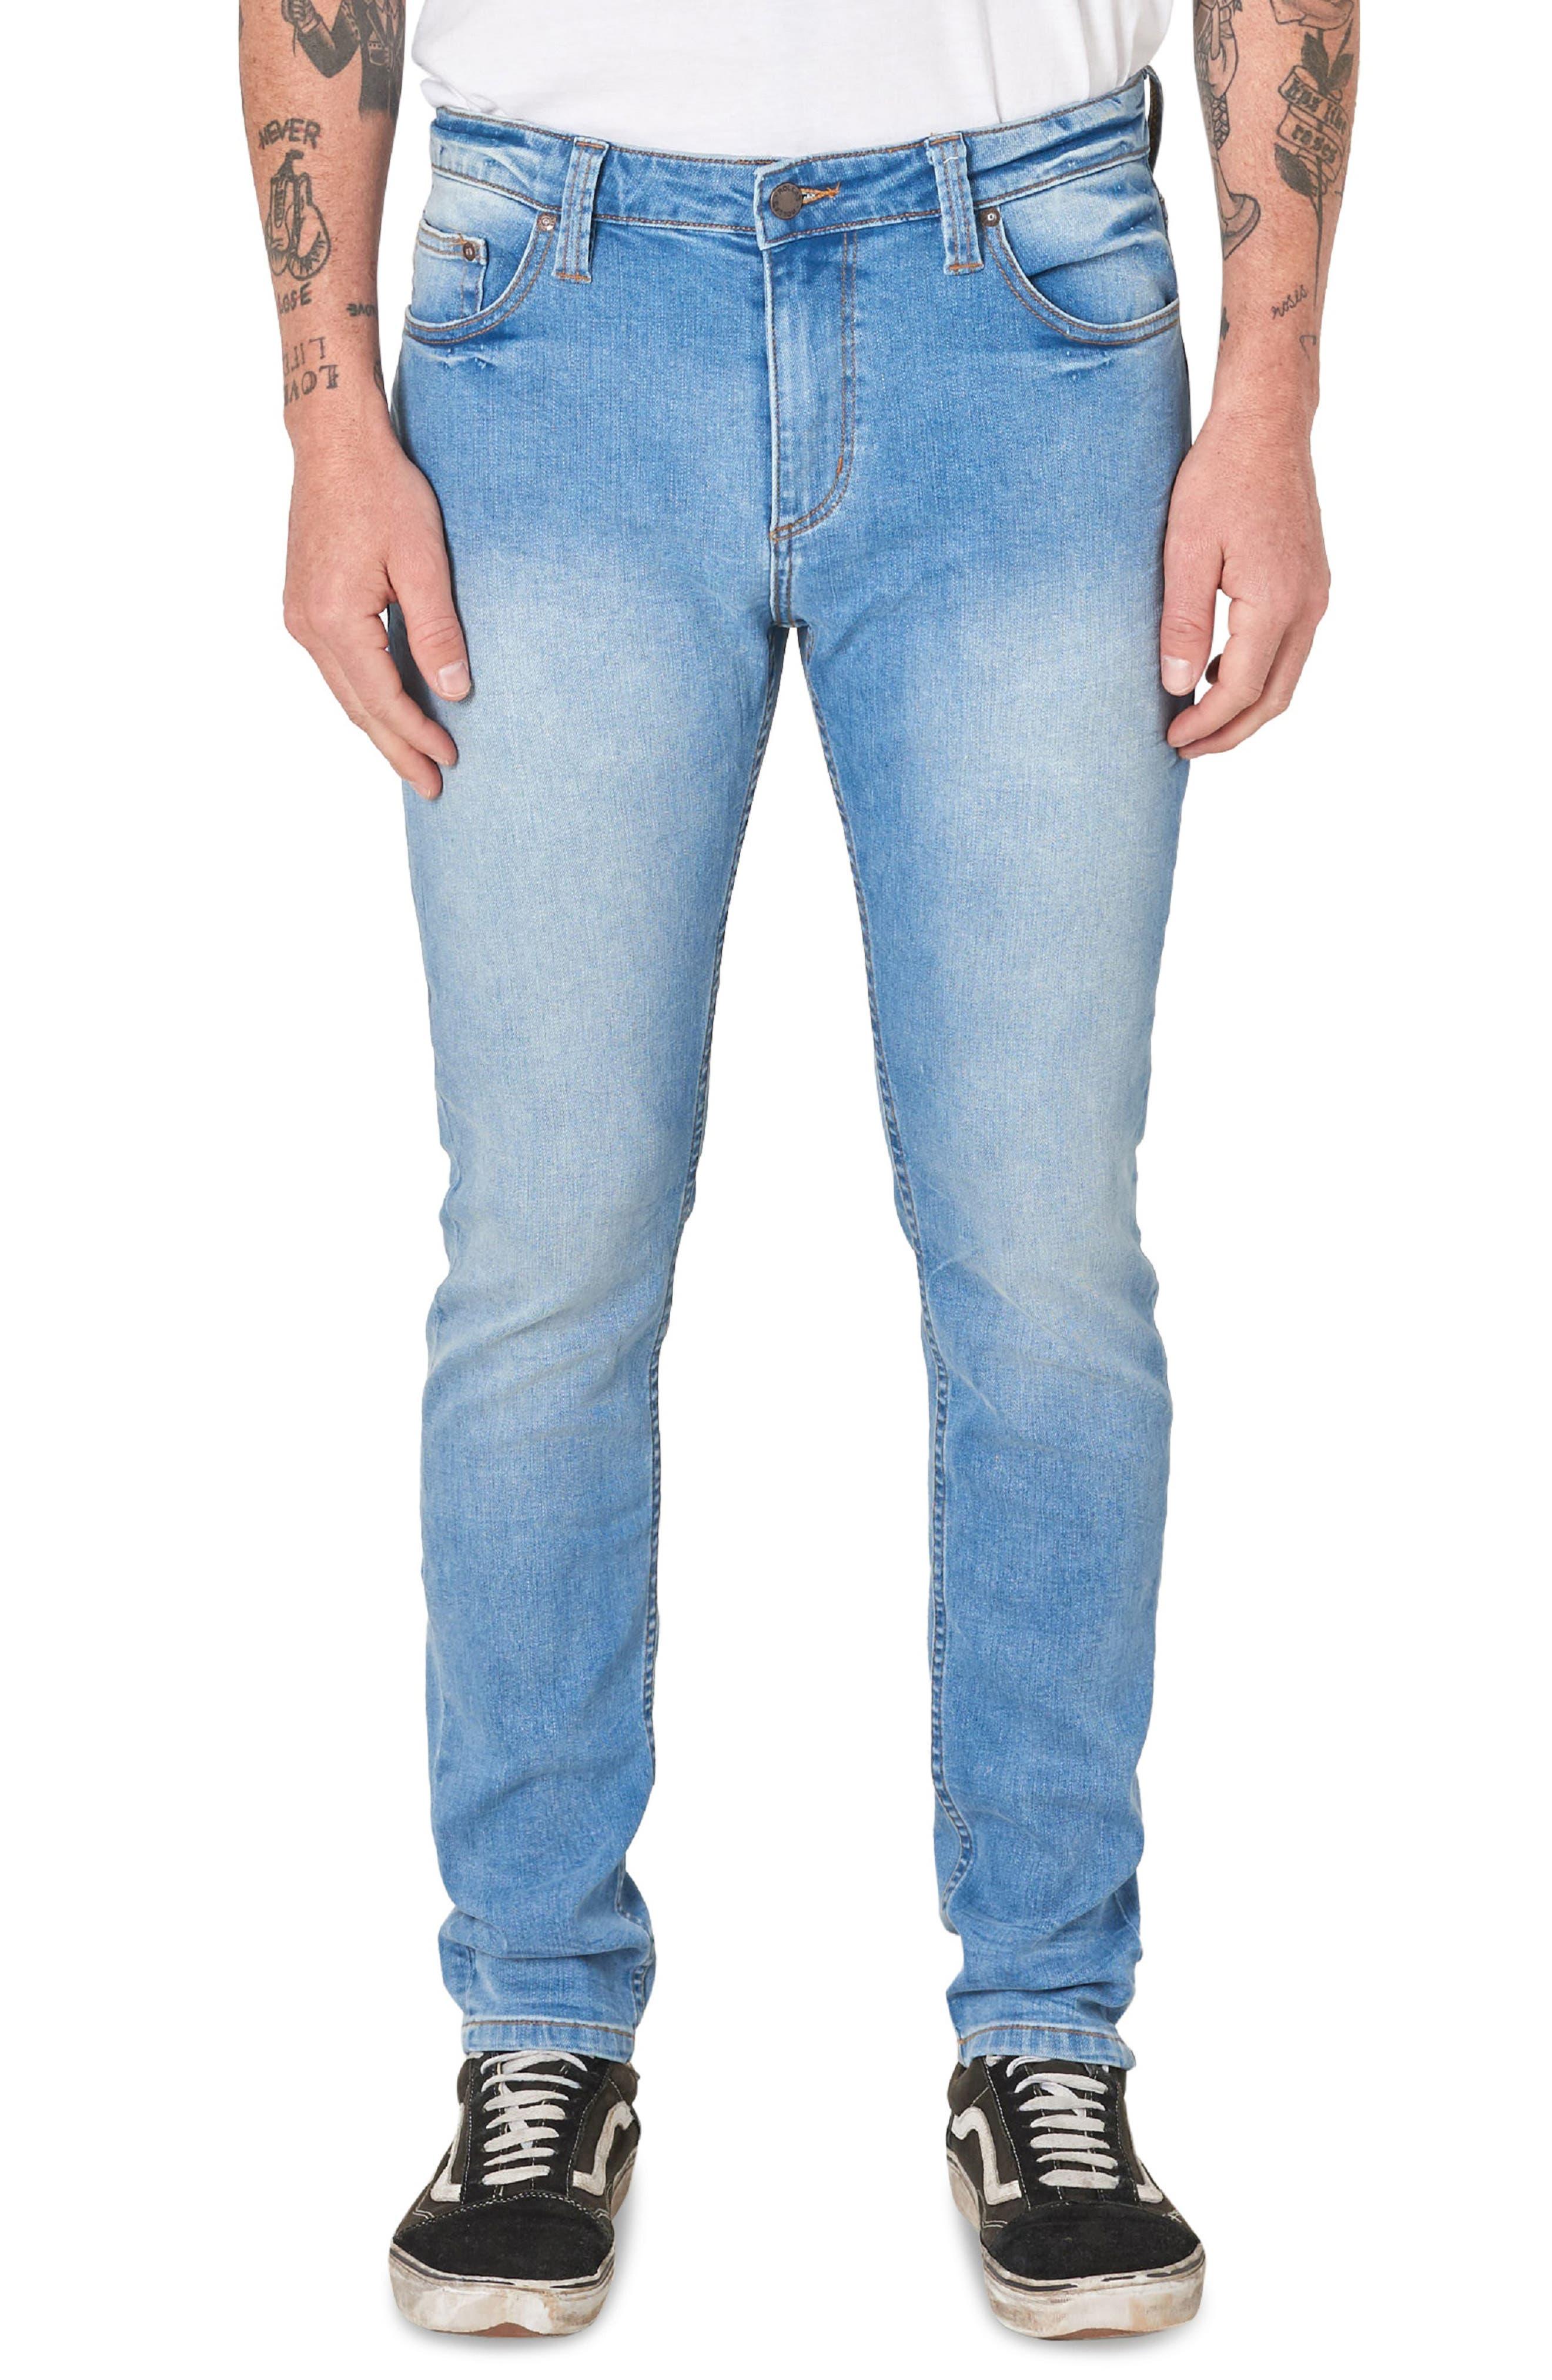 Stinger Skinny Fit Jeans,                             Main thumbnail 1, color,                             AUTHENTIC BLUE